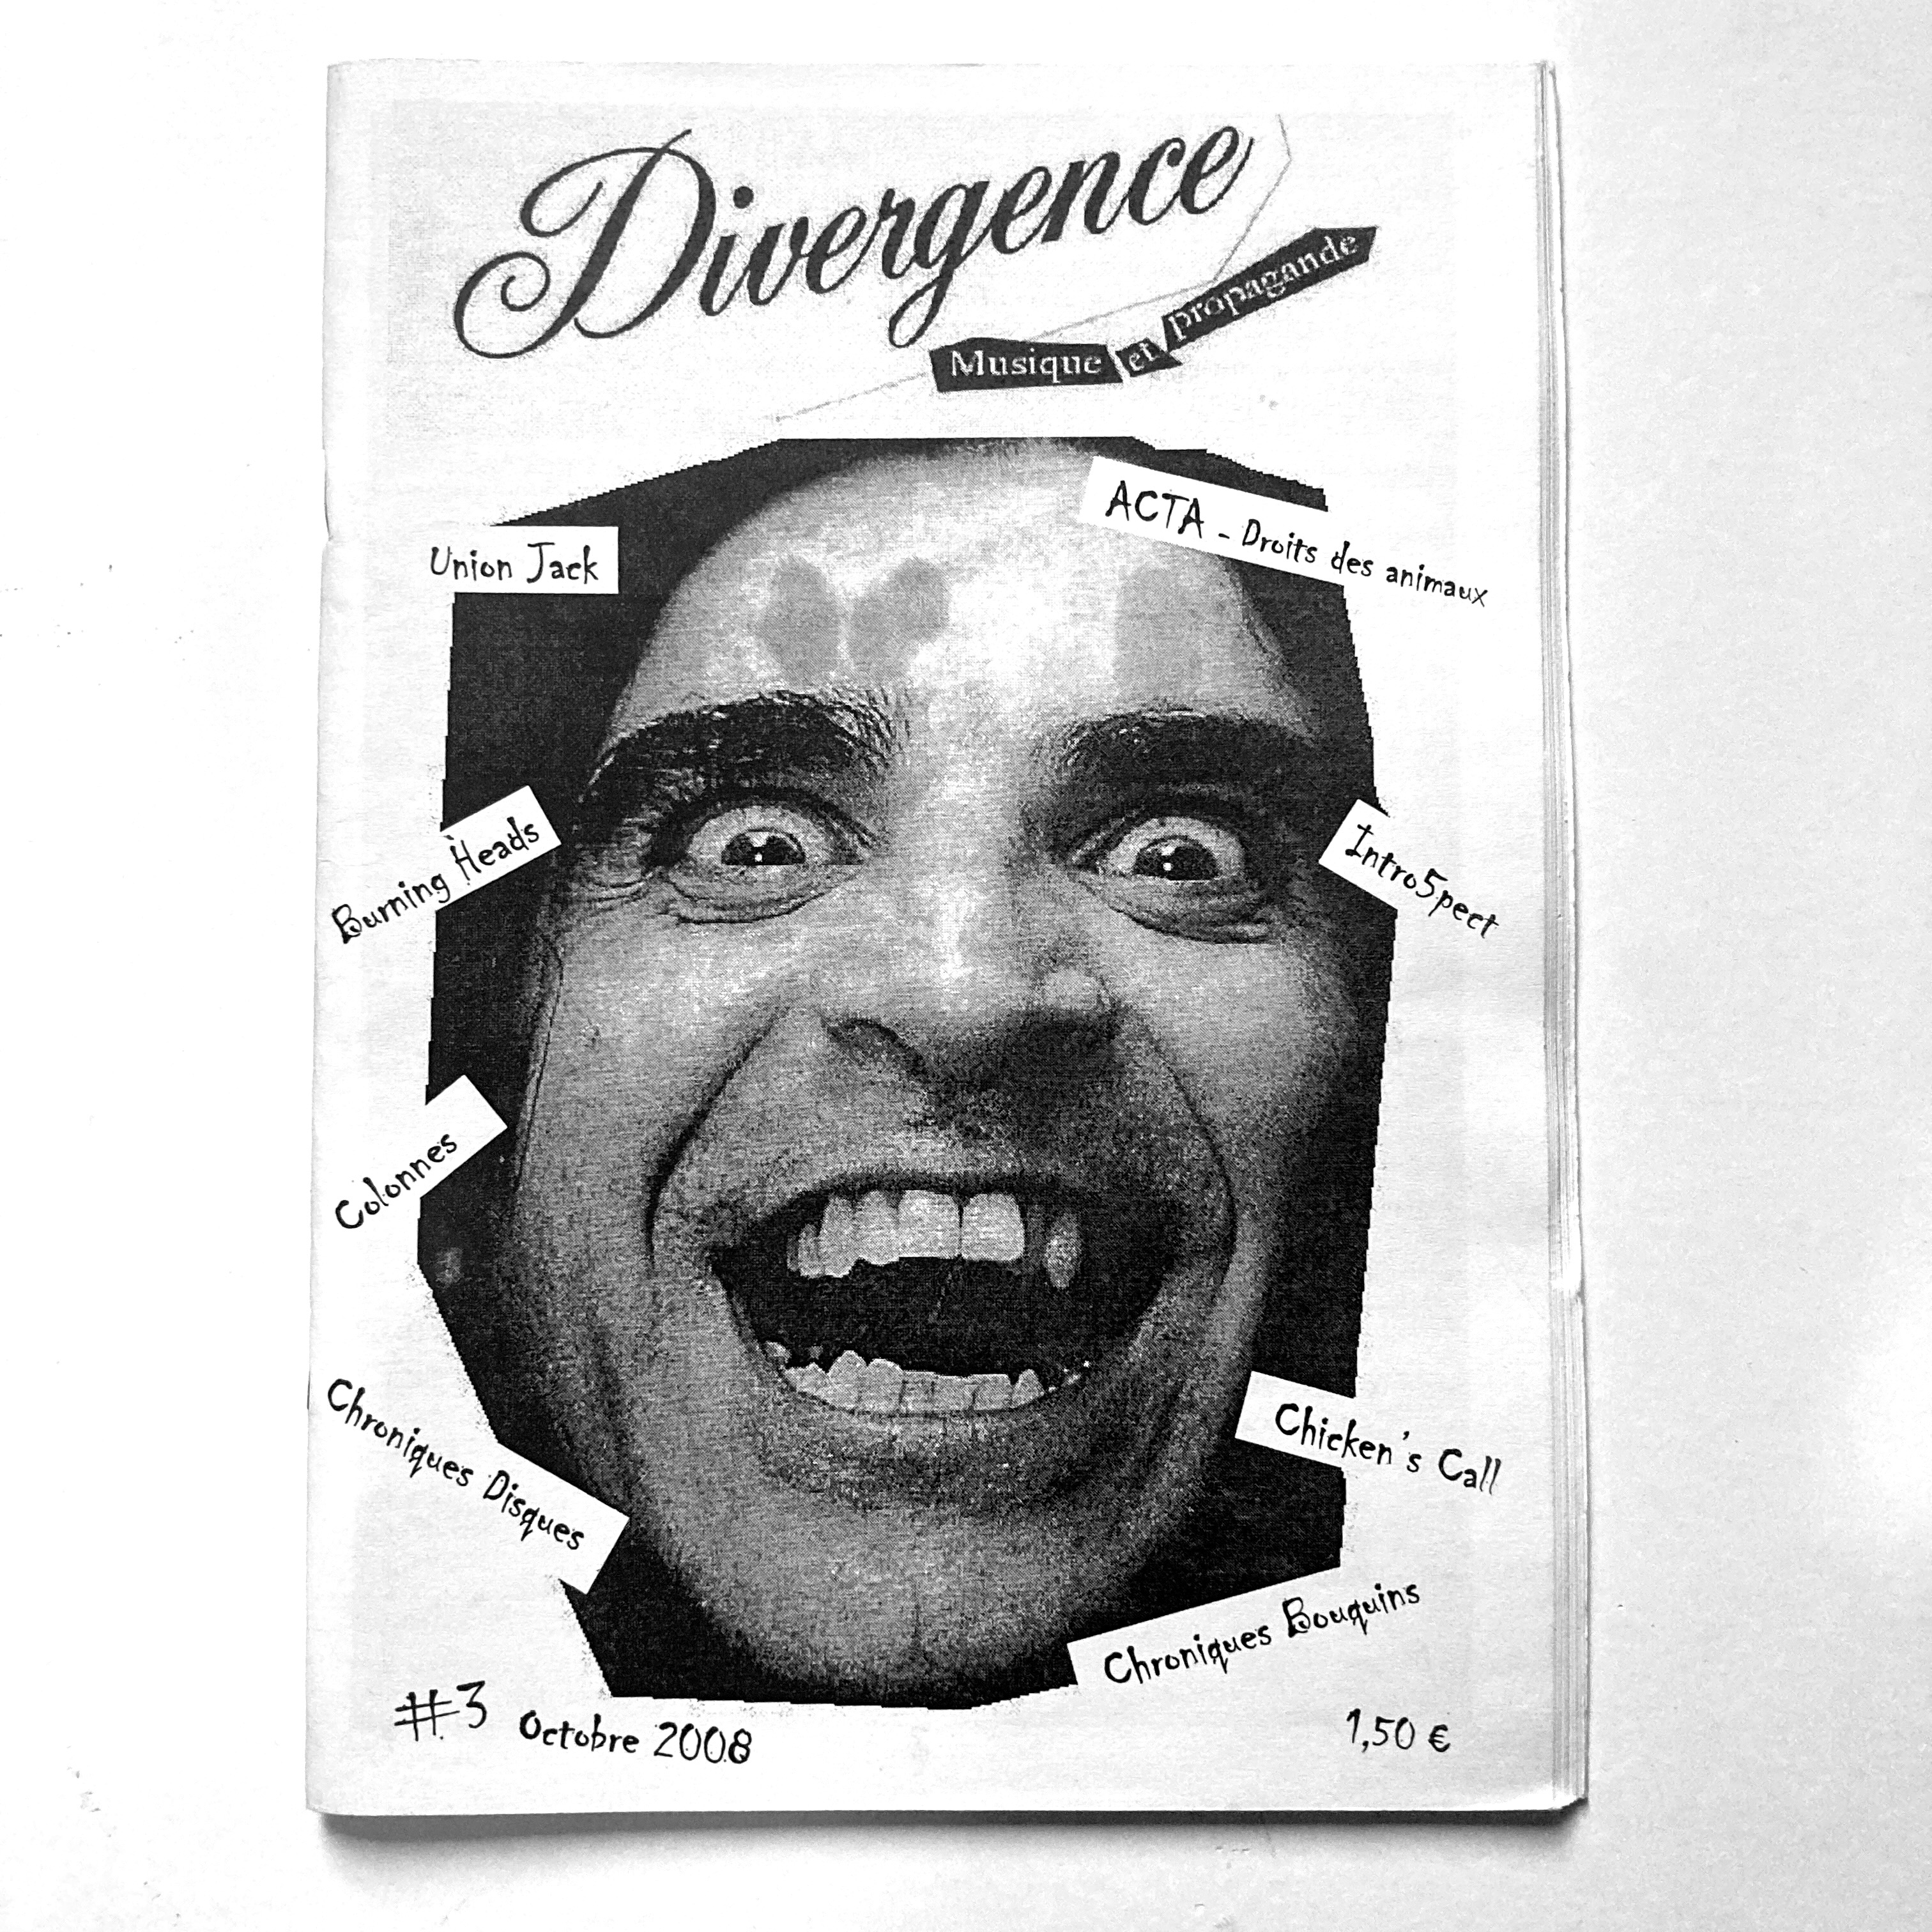 Divergence - #3